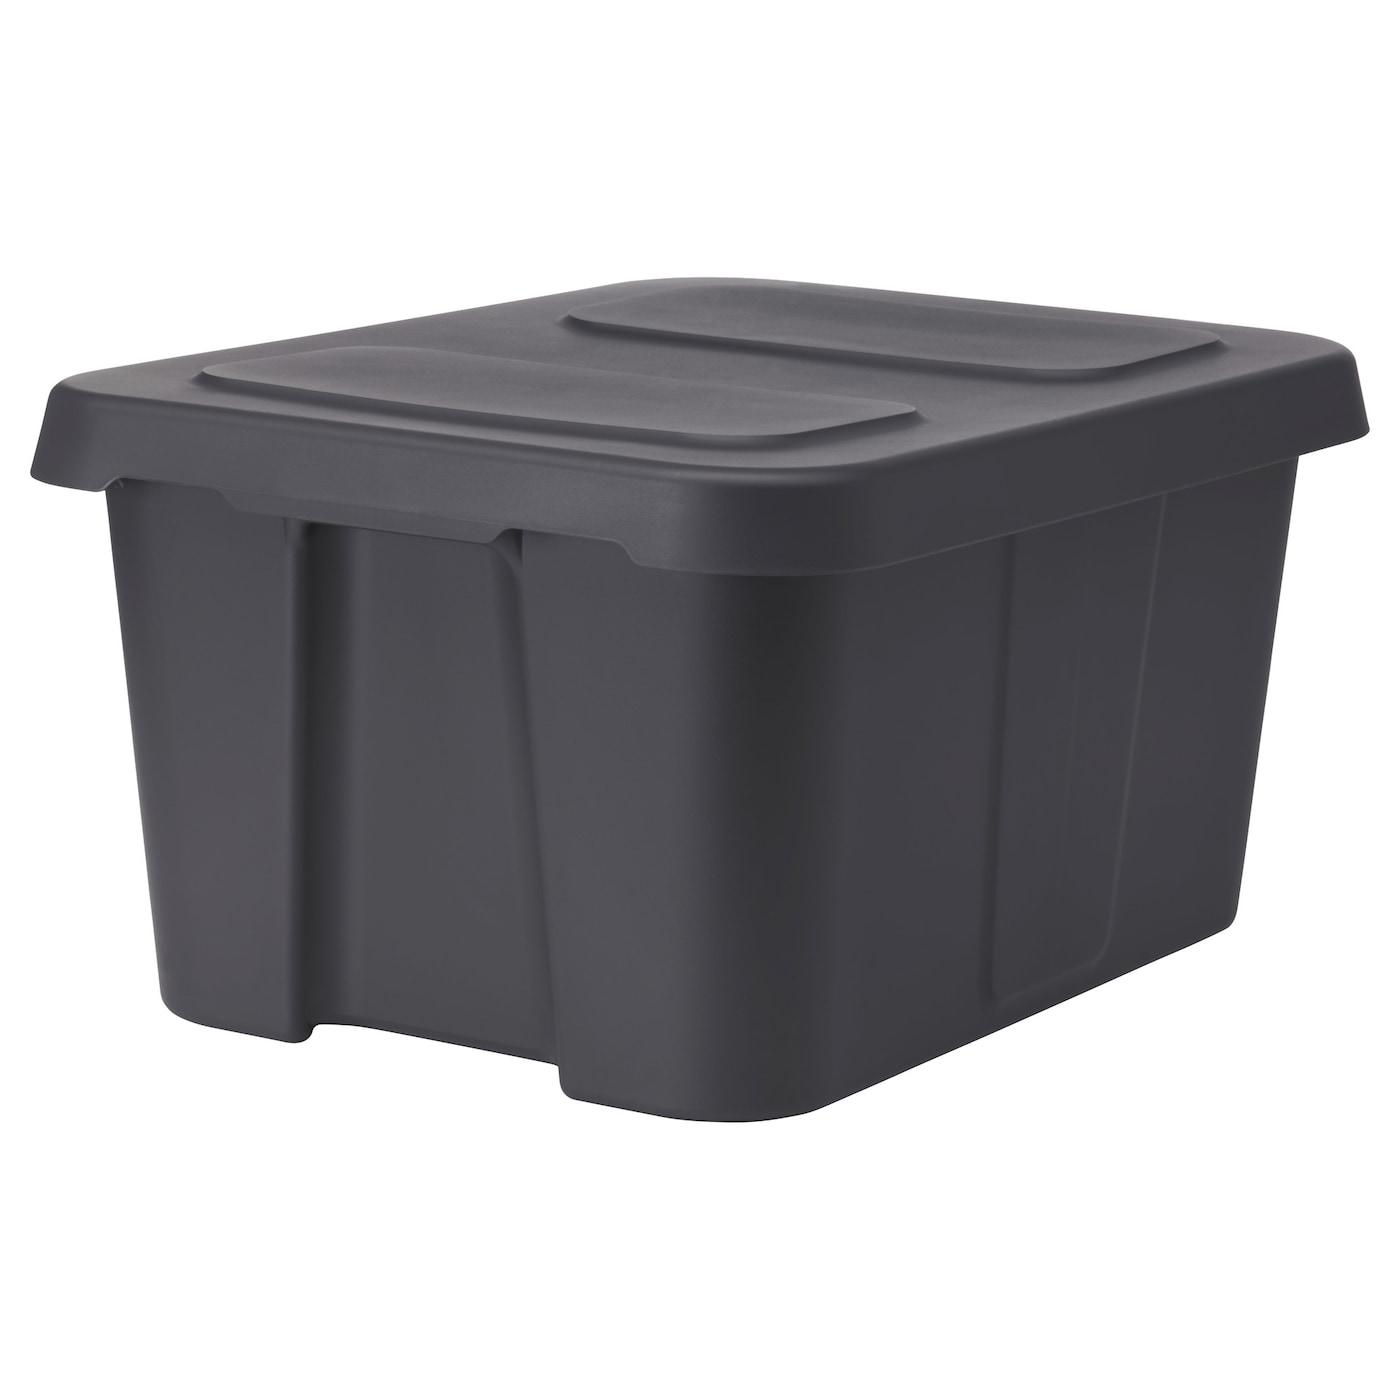 Kl Mtare Box With Lid In Outdoor Dark Grey 58x45x30 Cm Ikea